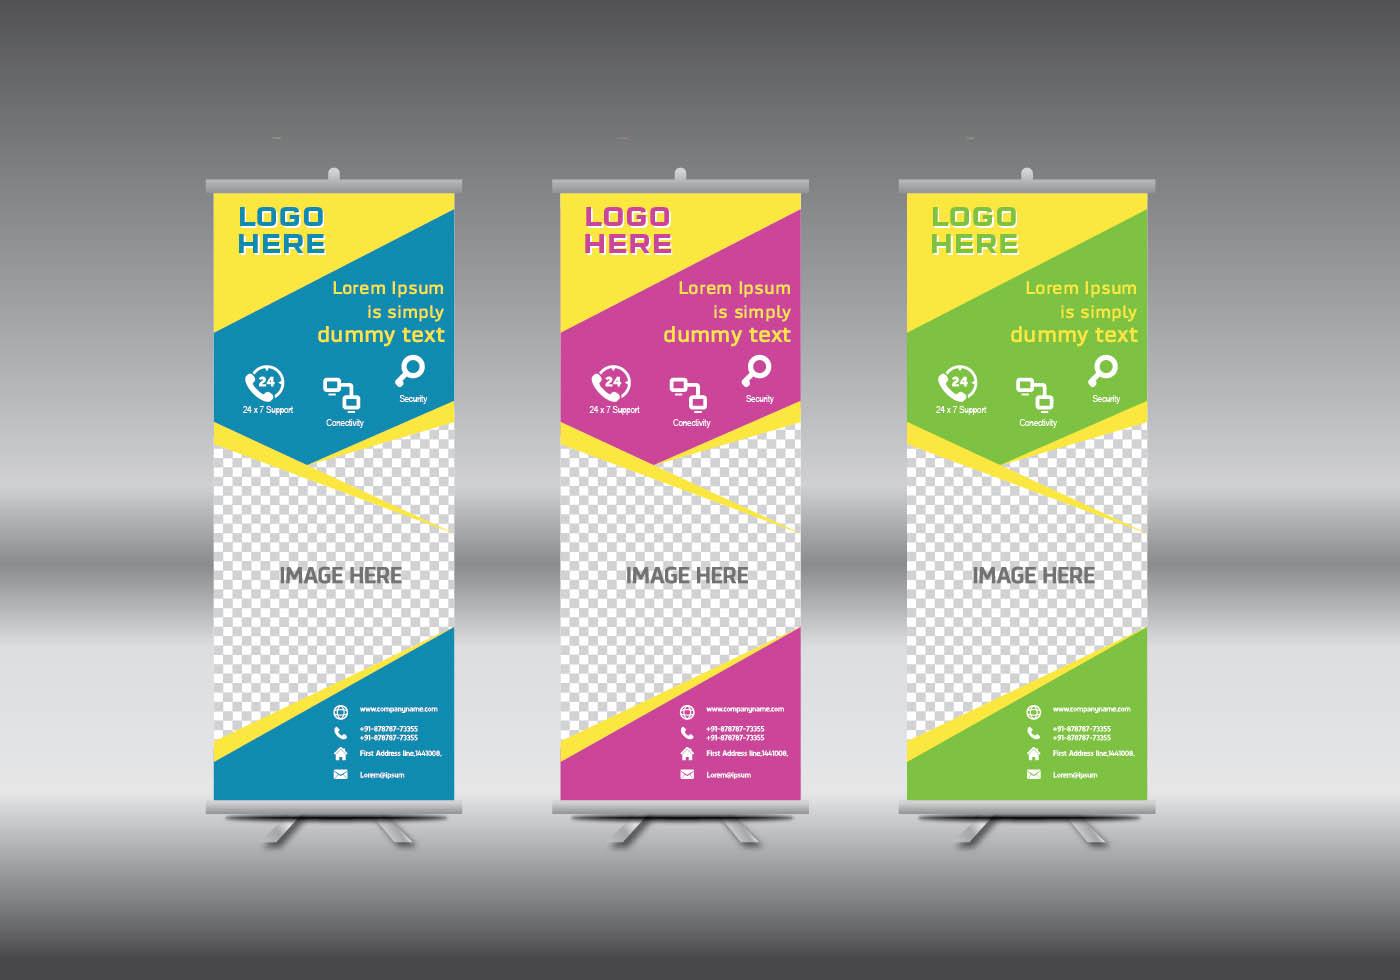 Banner Stand Design Templates - Costumepartyrun